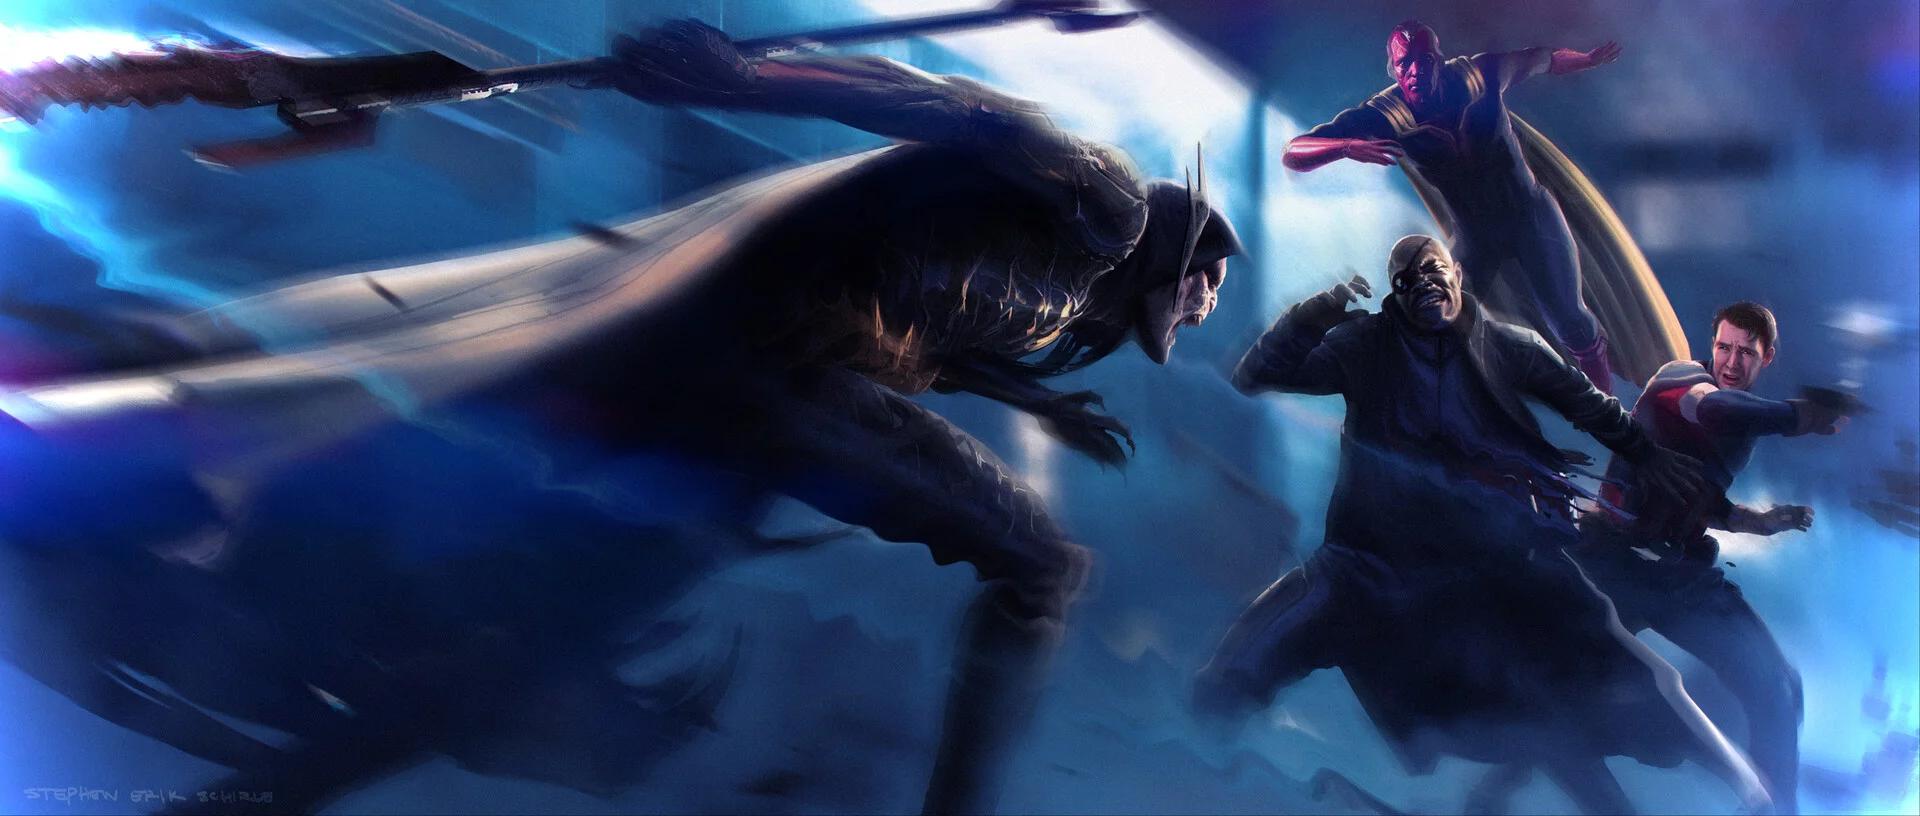 2020-02-avengers12-5e50159dd16fc